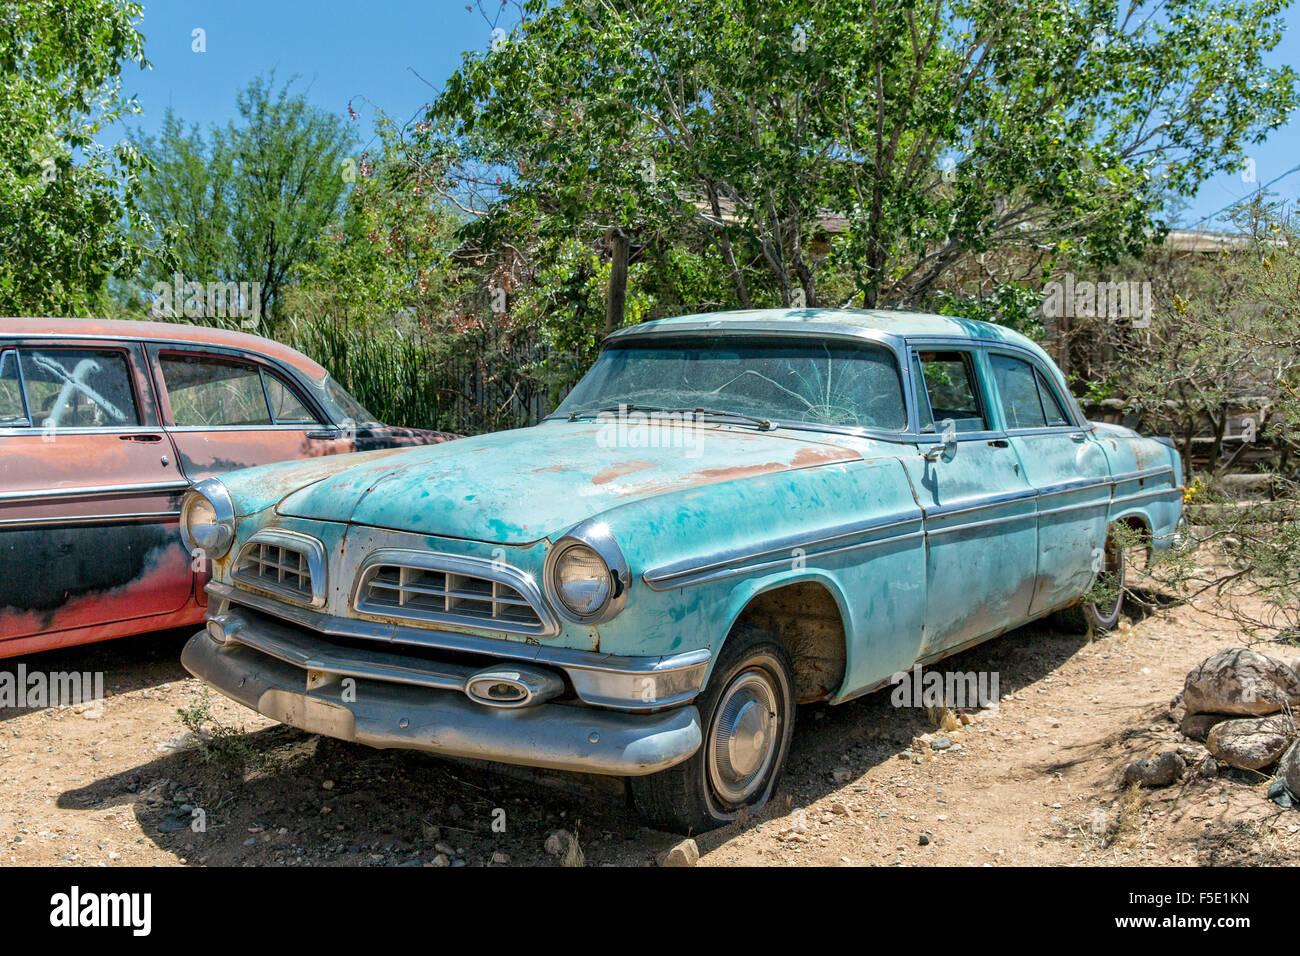 Old and rusty car at Hackberry General Store, Kingman, Arizona, USA Stock Photo